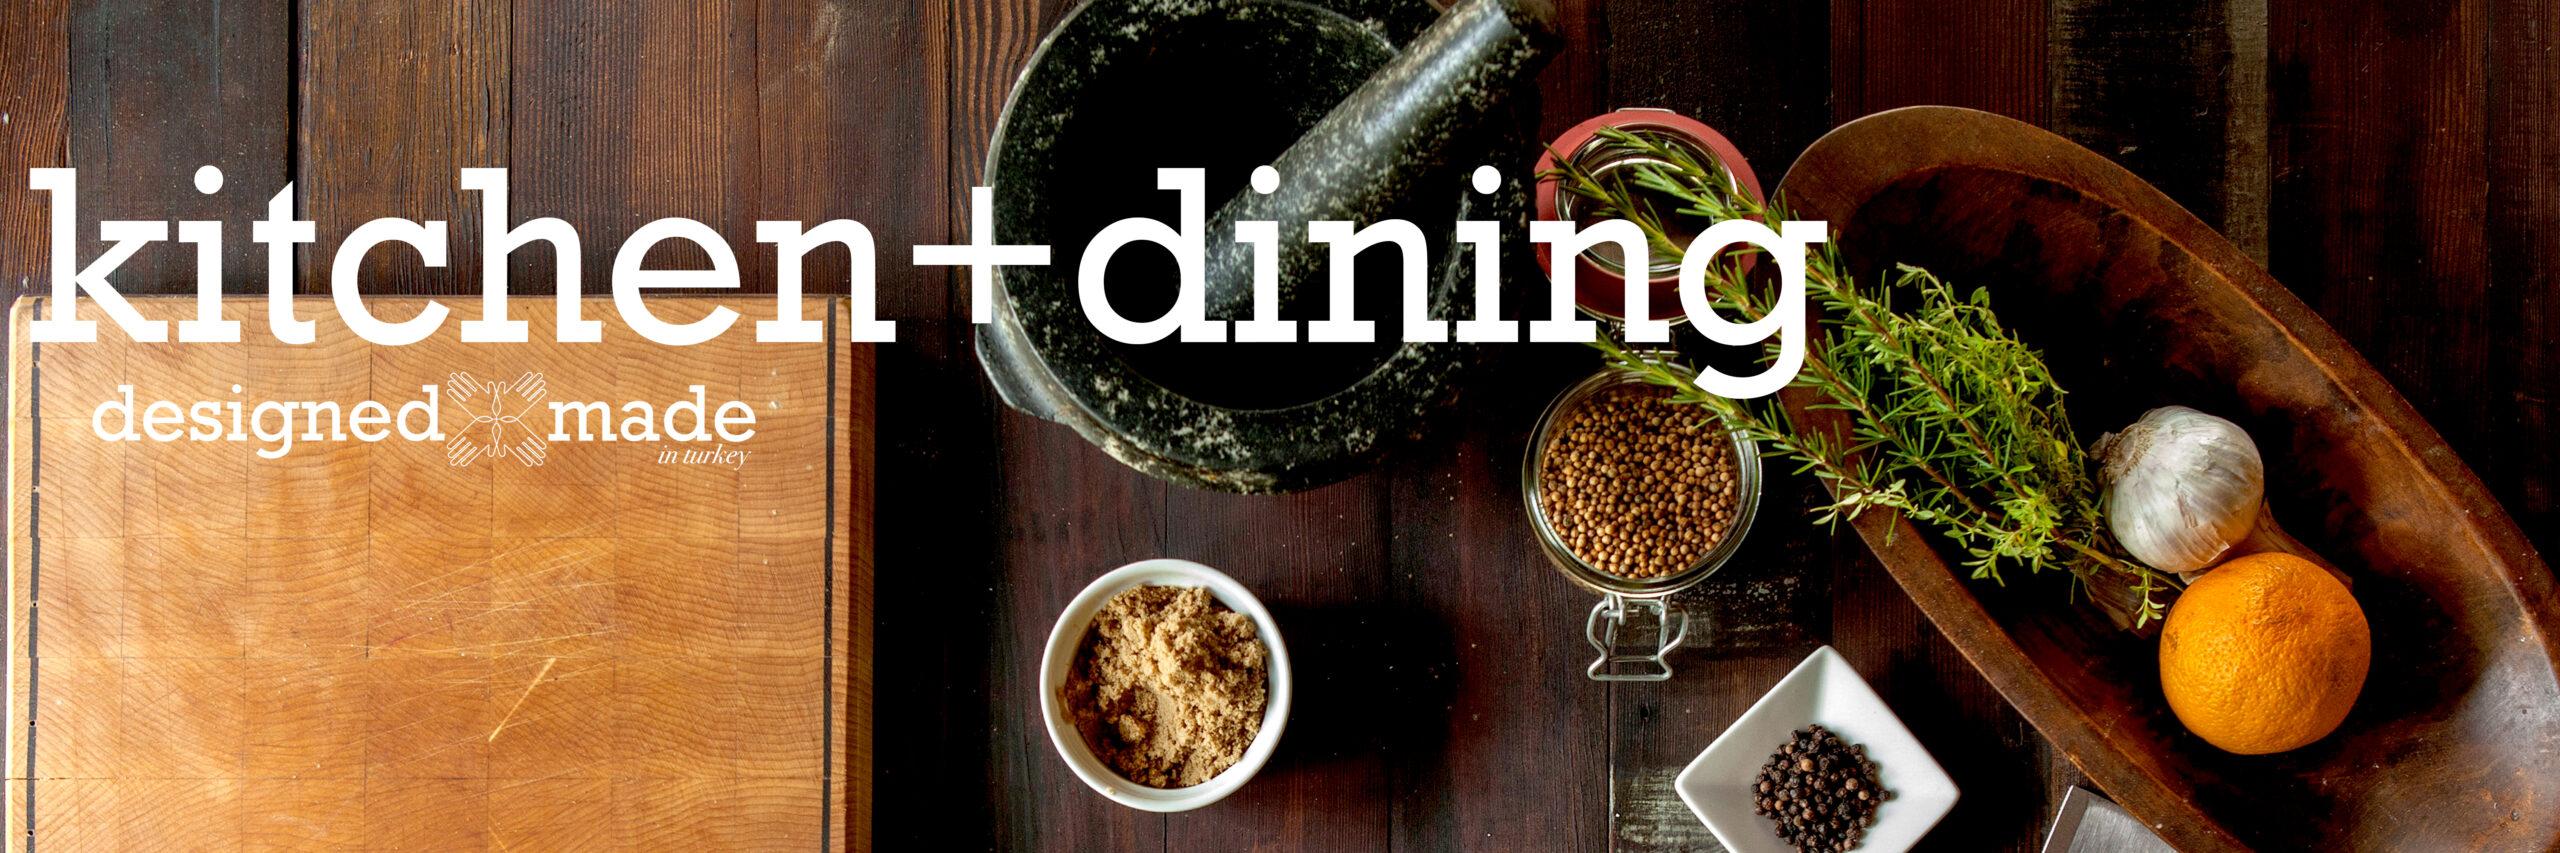 autumn-kitchen-and-dining_01